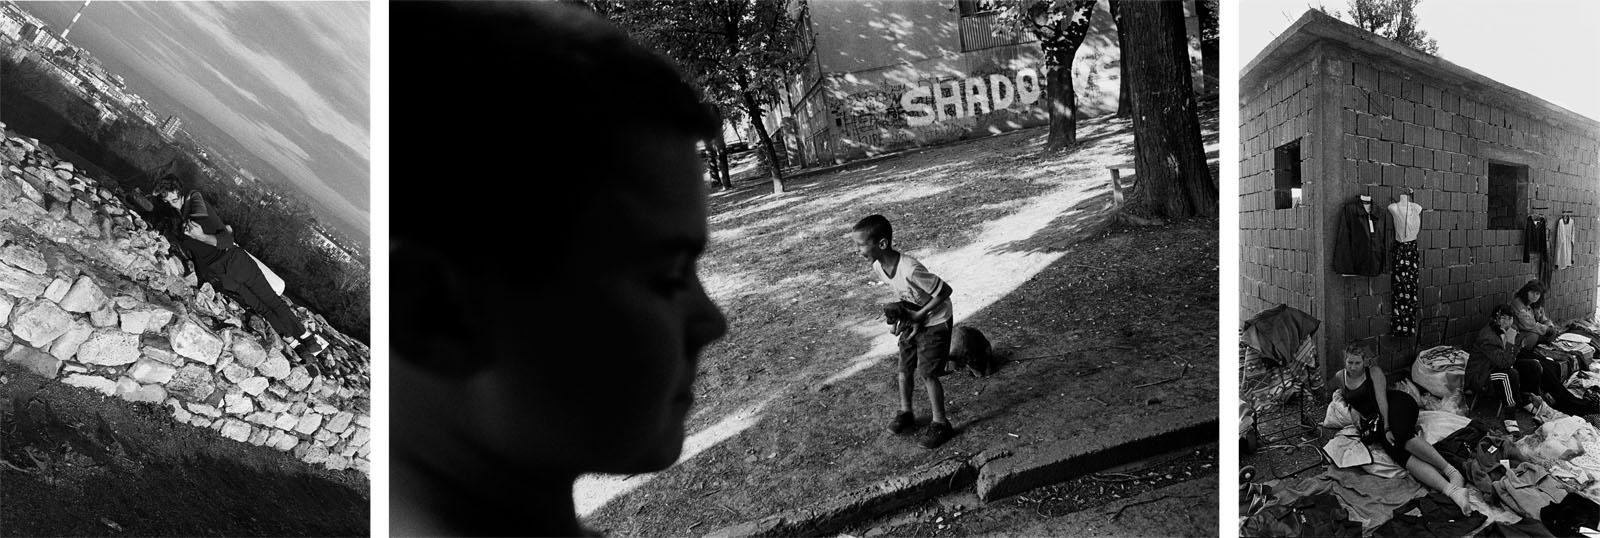 Art and Documentary Photography - Loading BGD___Fabio_Sgroi_034.jpg